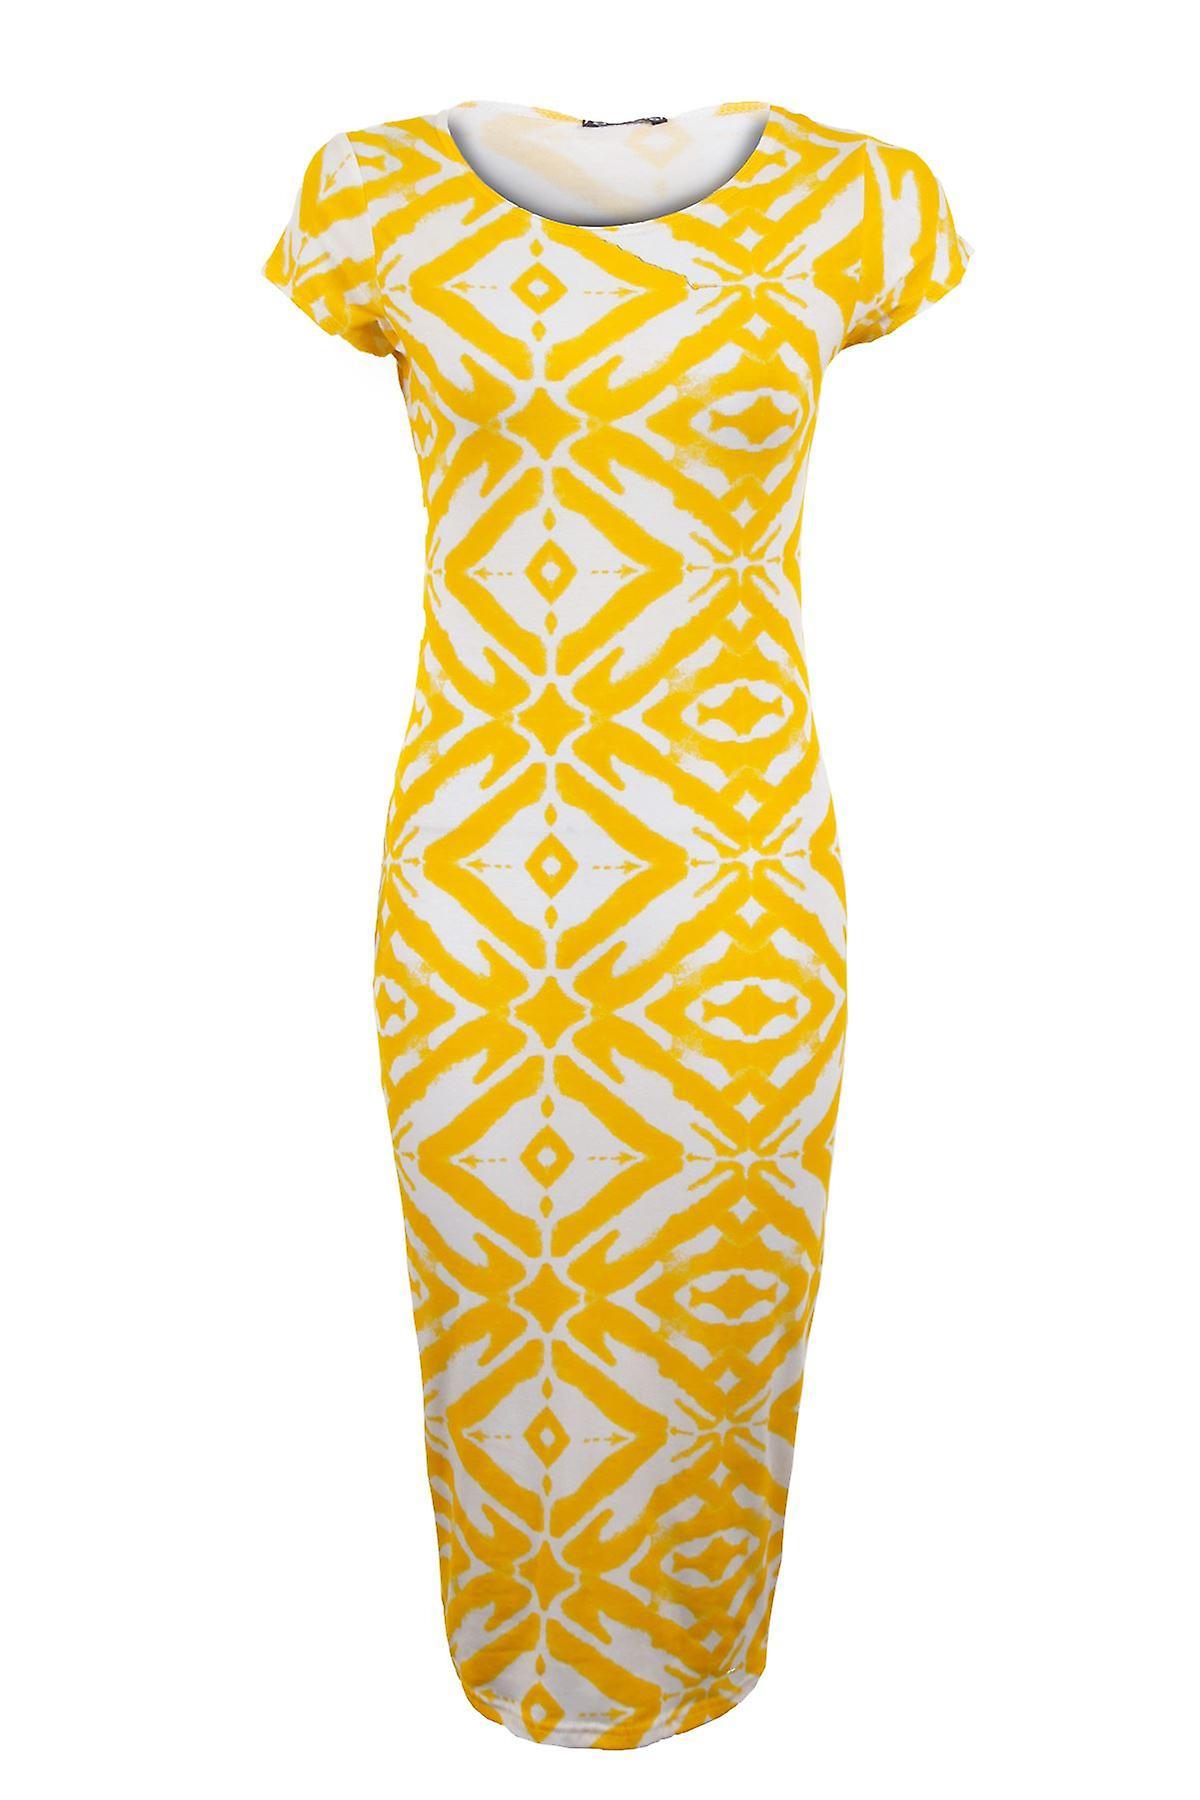 New Ladies Cap Sleeve Tribal Snake Print Midi Women's Bodycon Dress AOSMiP